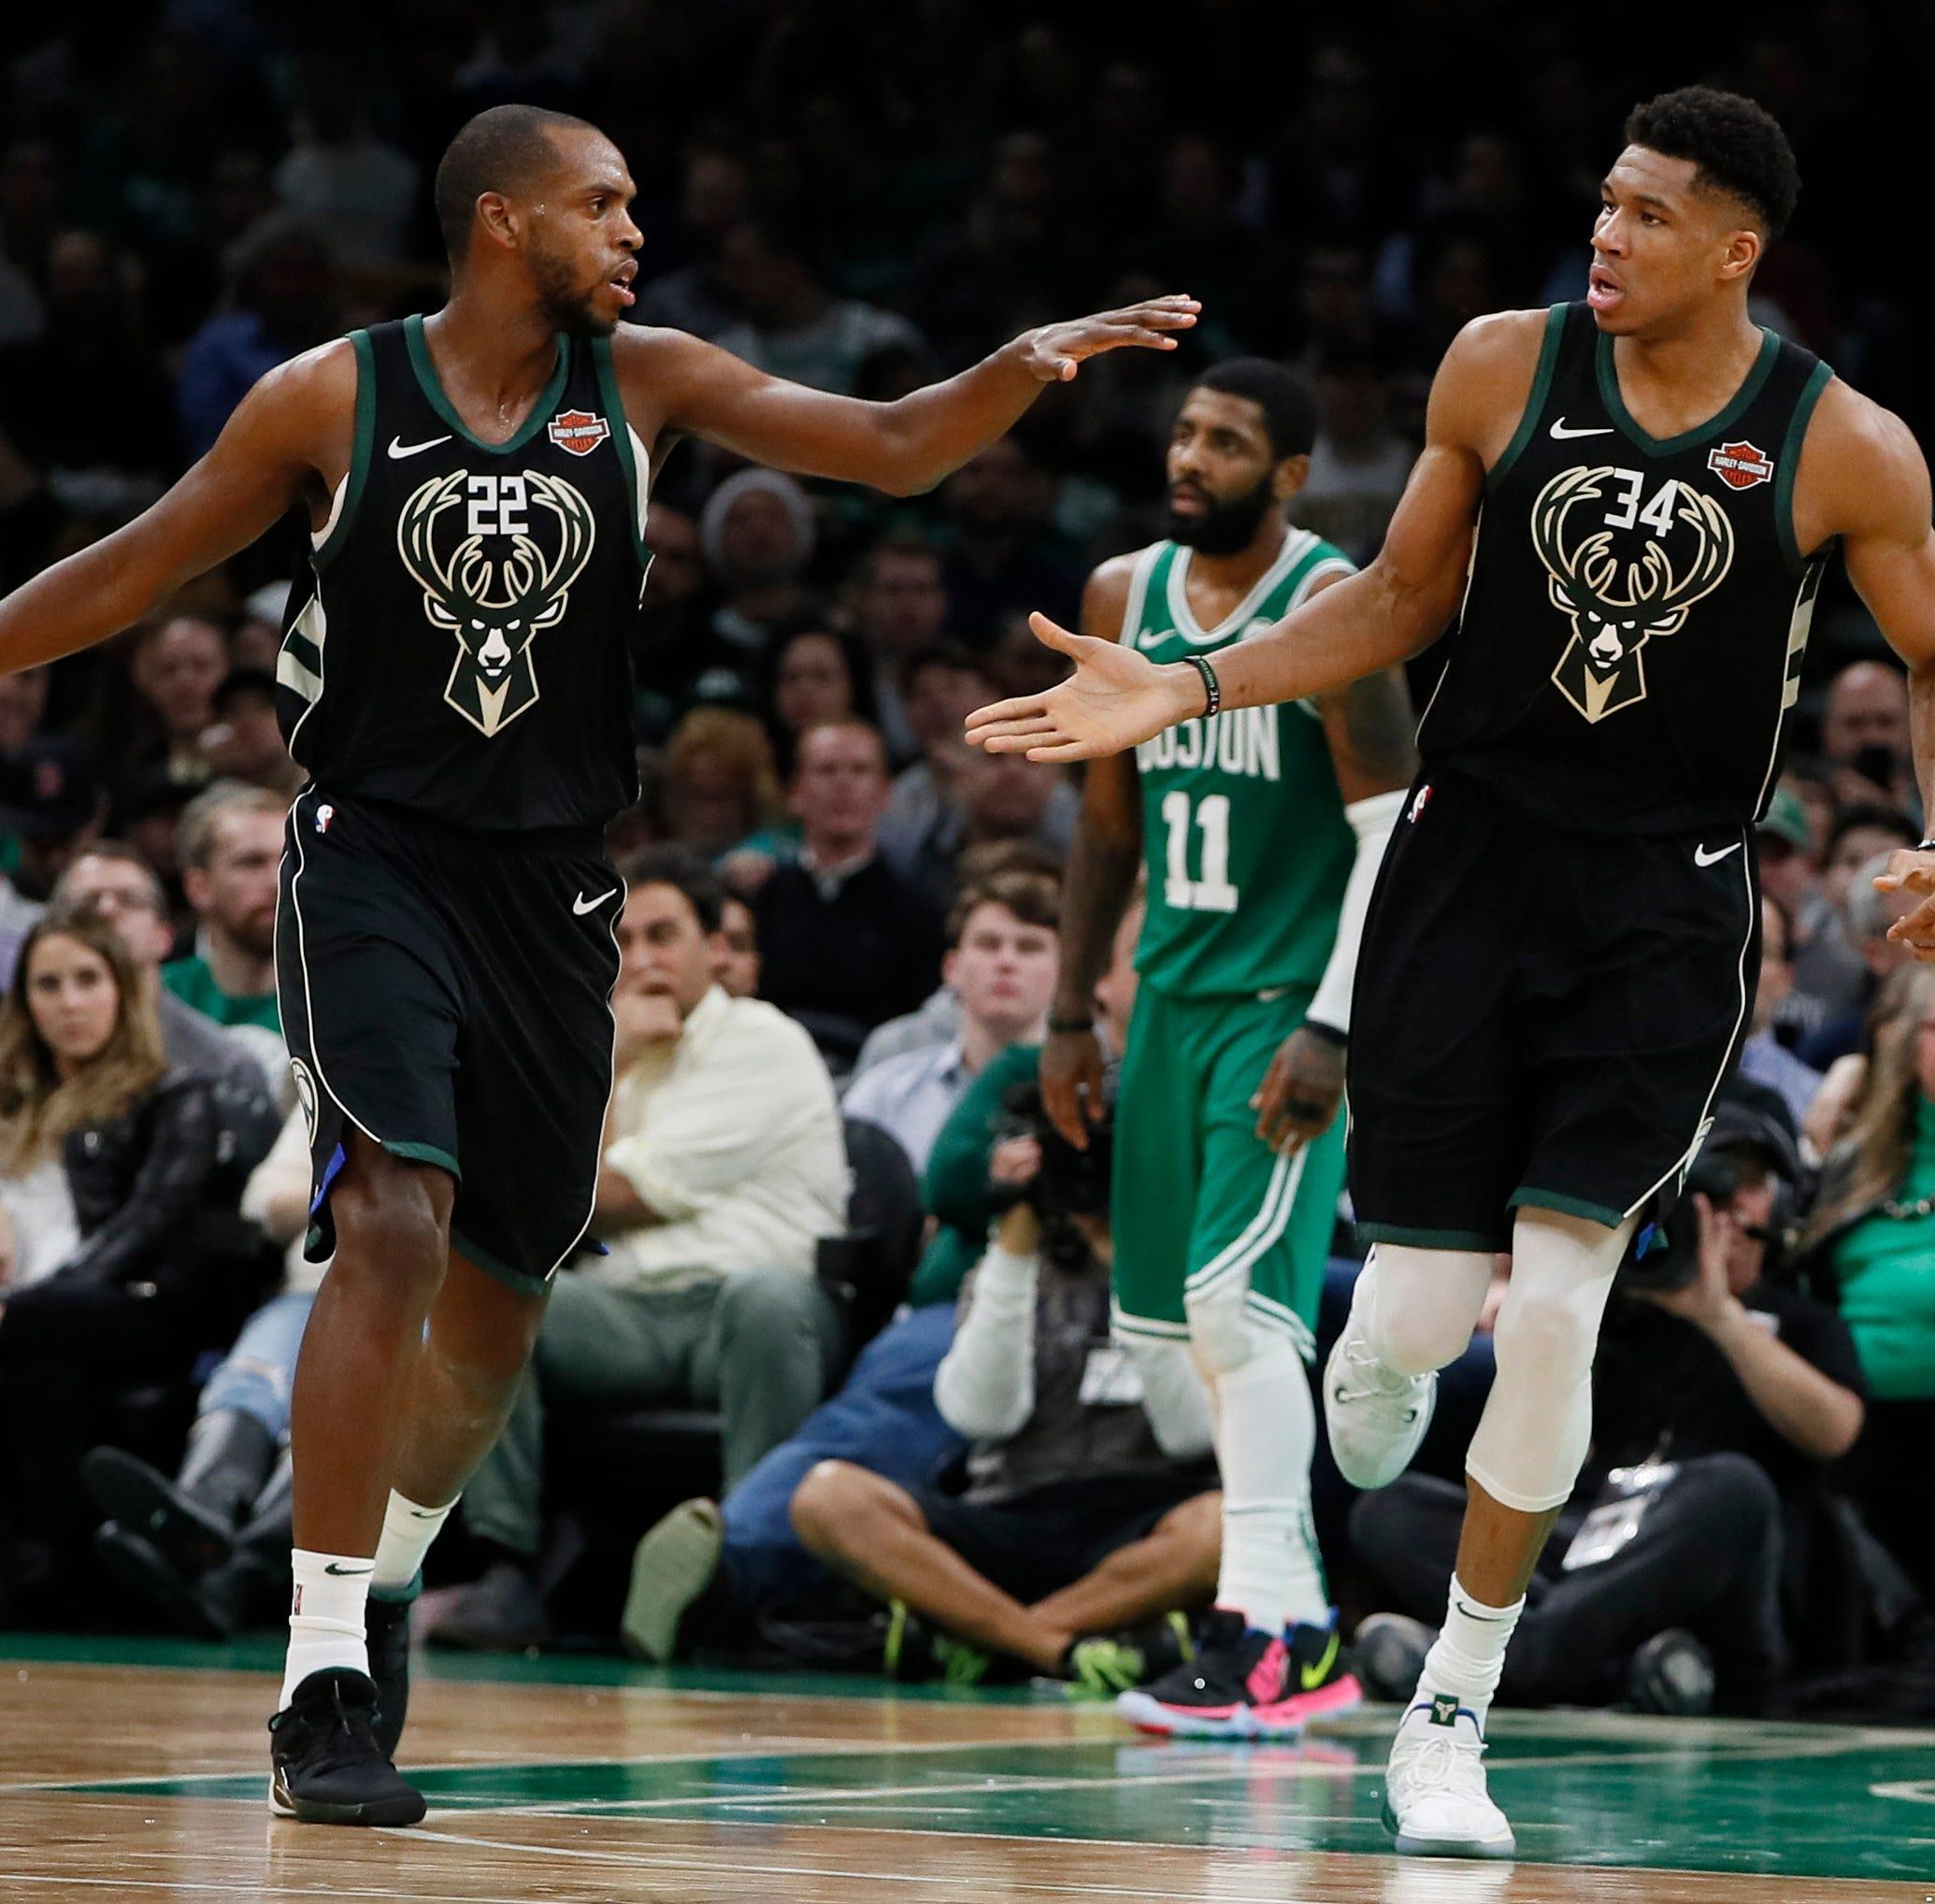 Bucks' second playoff series against Celtics has plenty of storylines